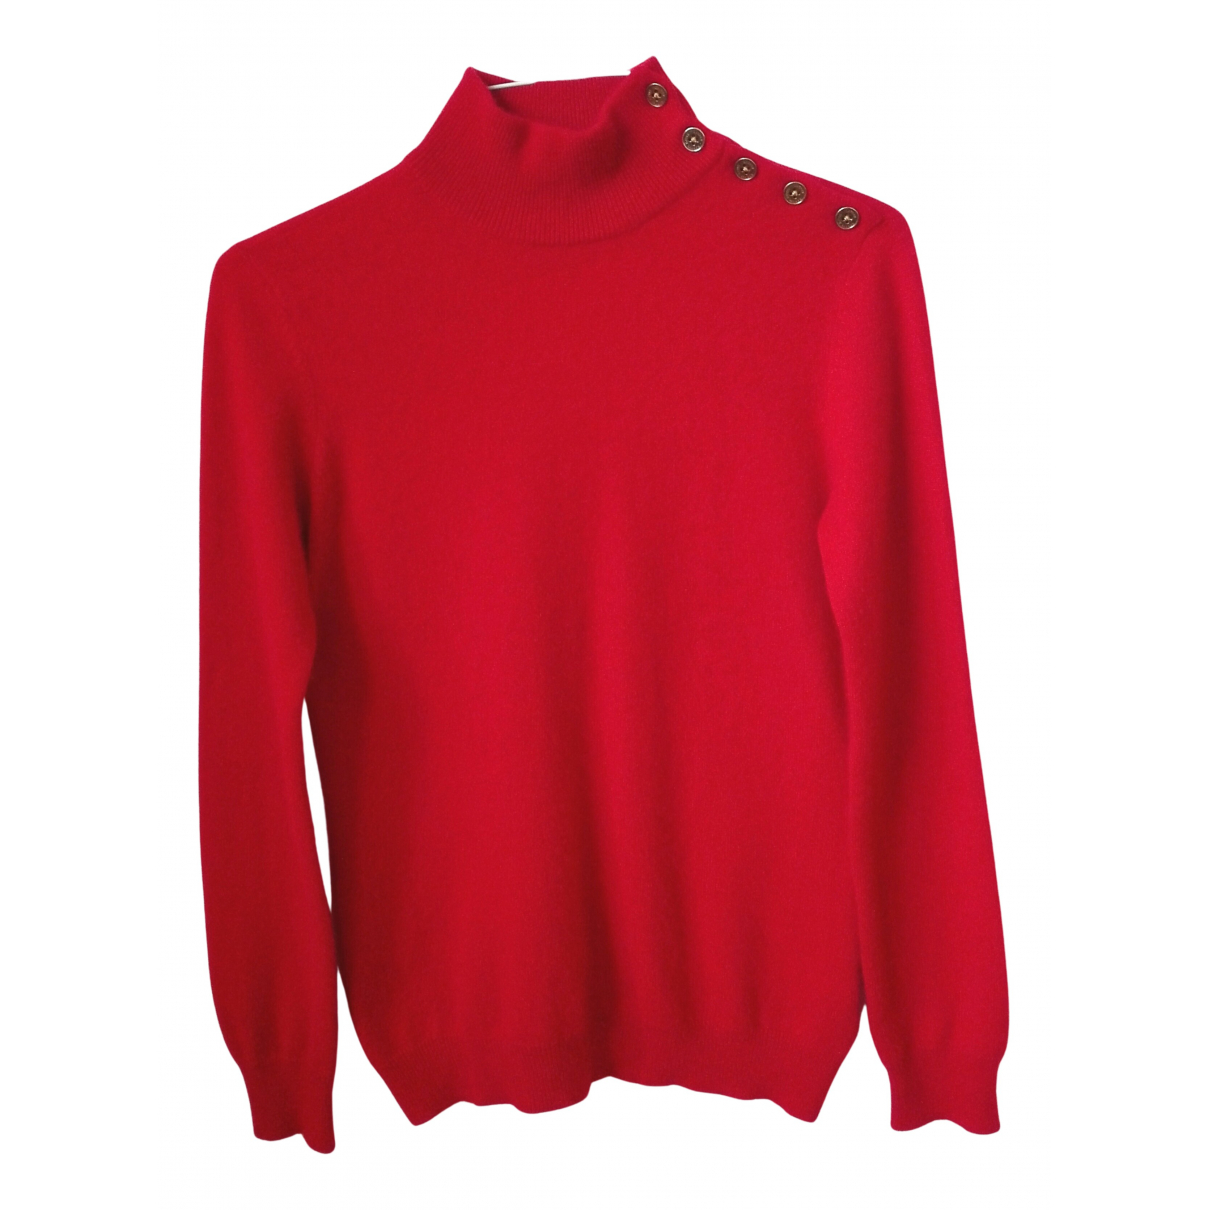 Lauren Ralph Lauren - Pull   pour femme en cachemire - rouge